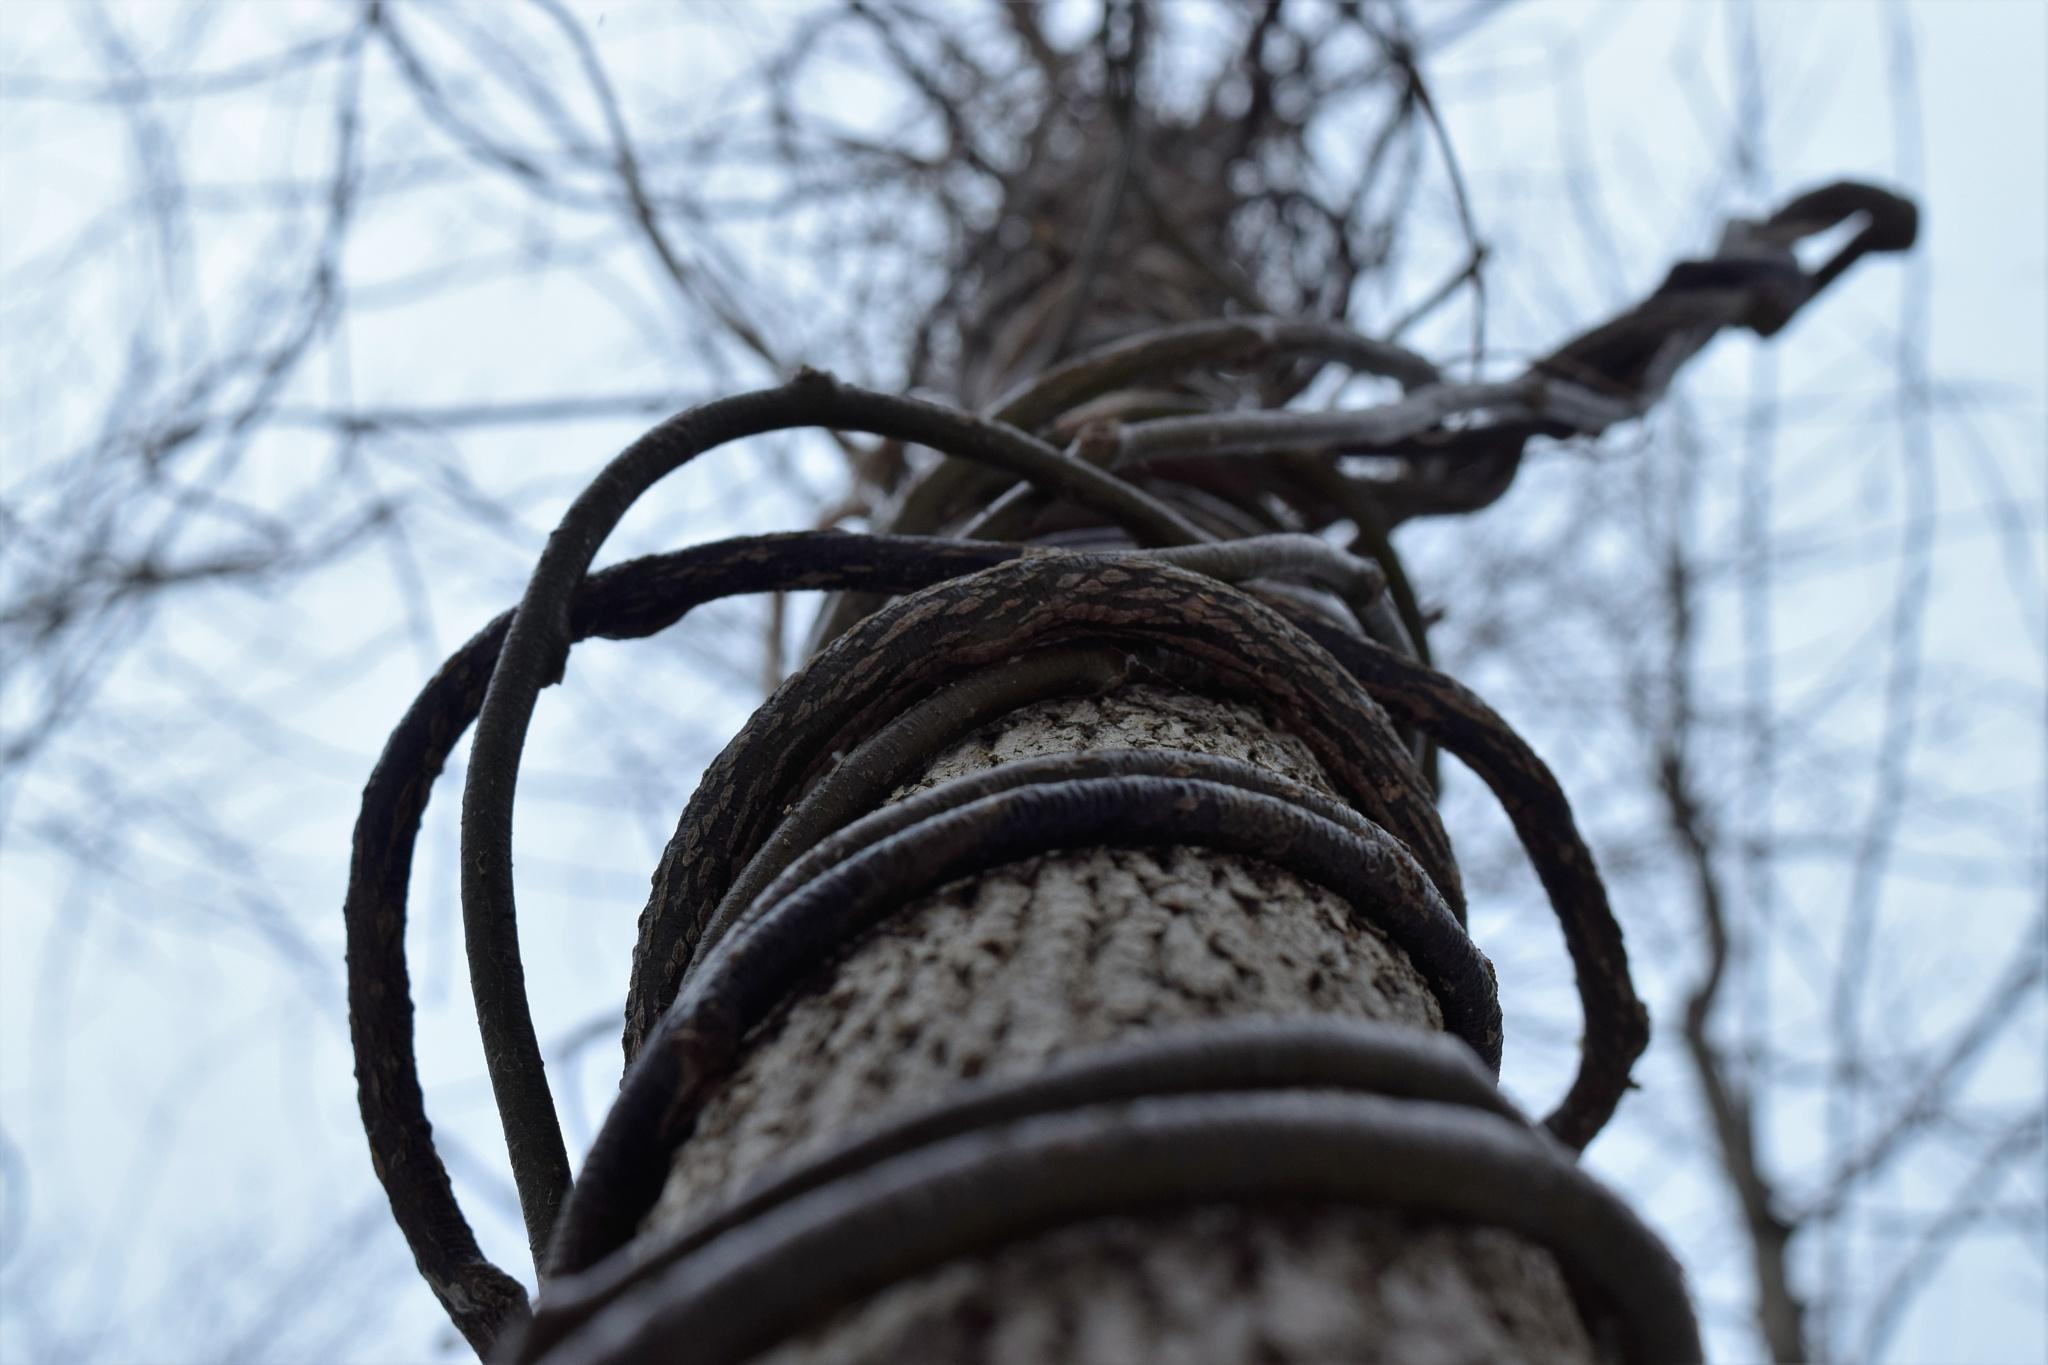 Vines go up a tree by Matthew Brian Greffe